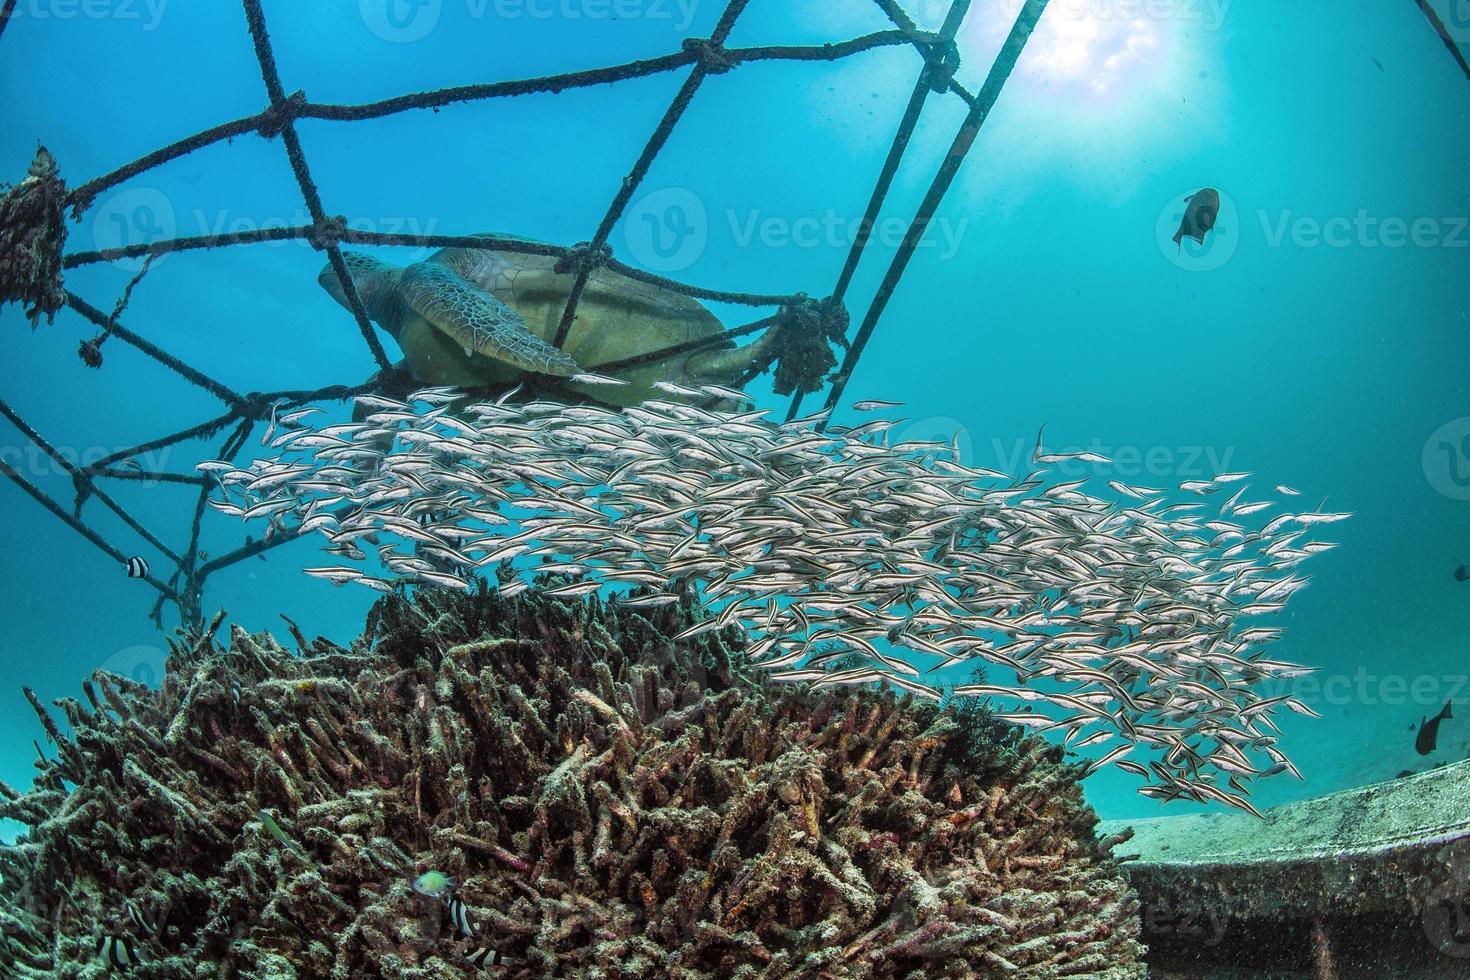 School of juvenile Striped Eel Catfish photo